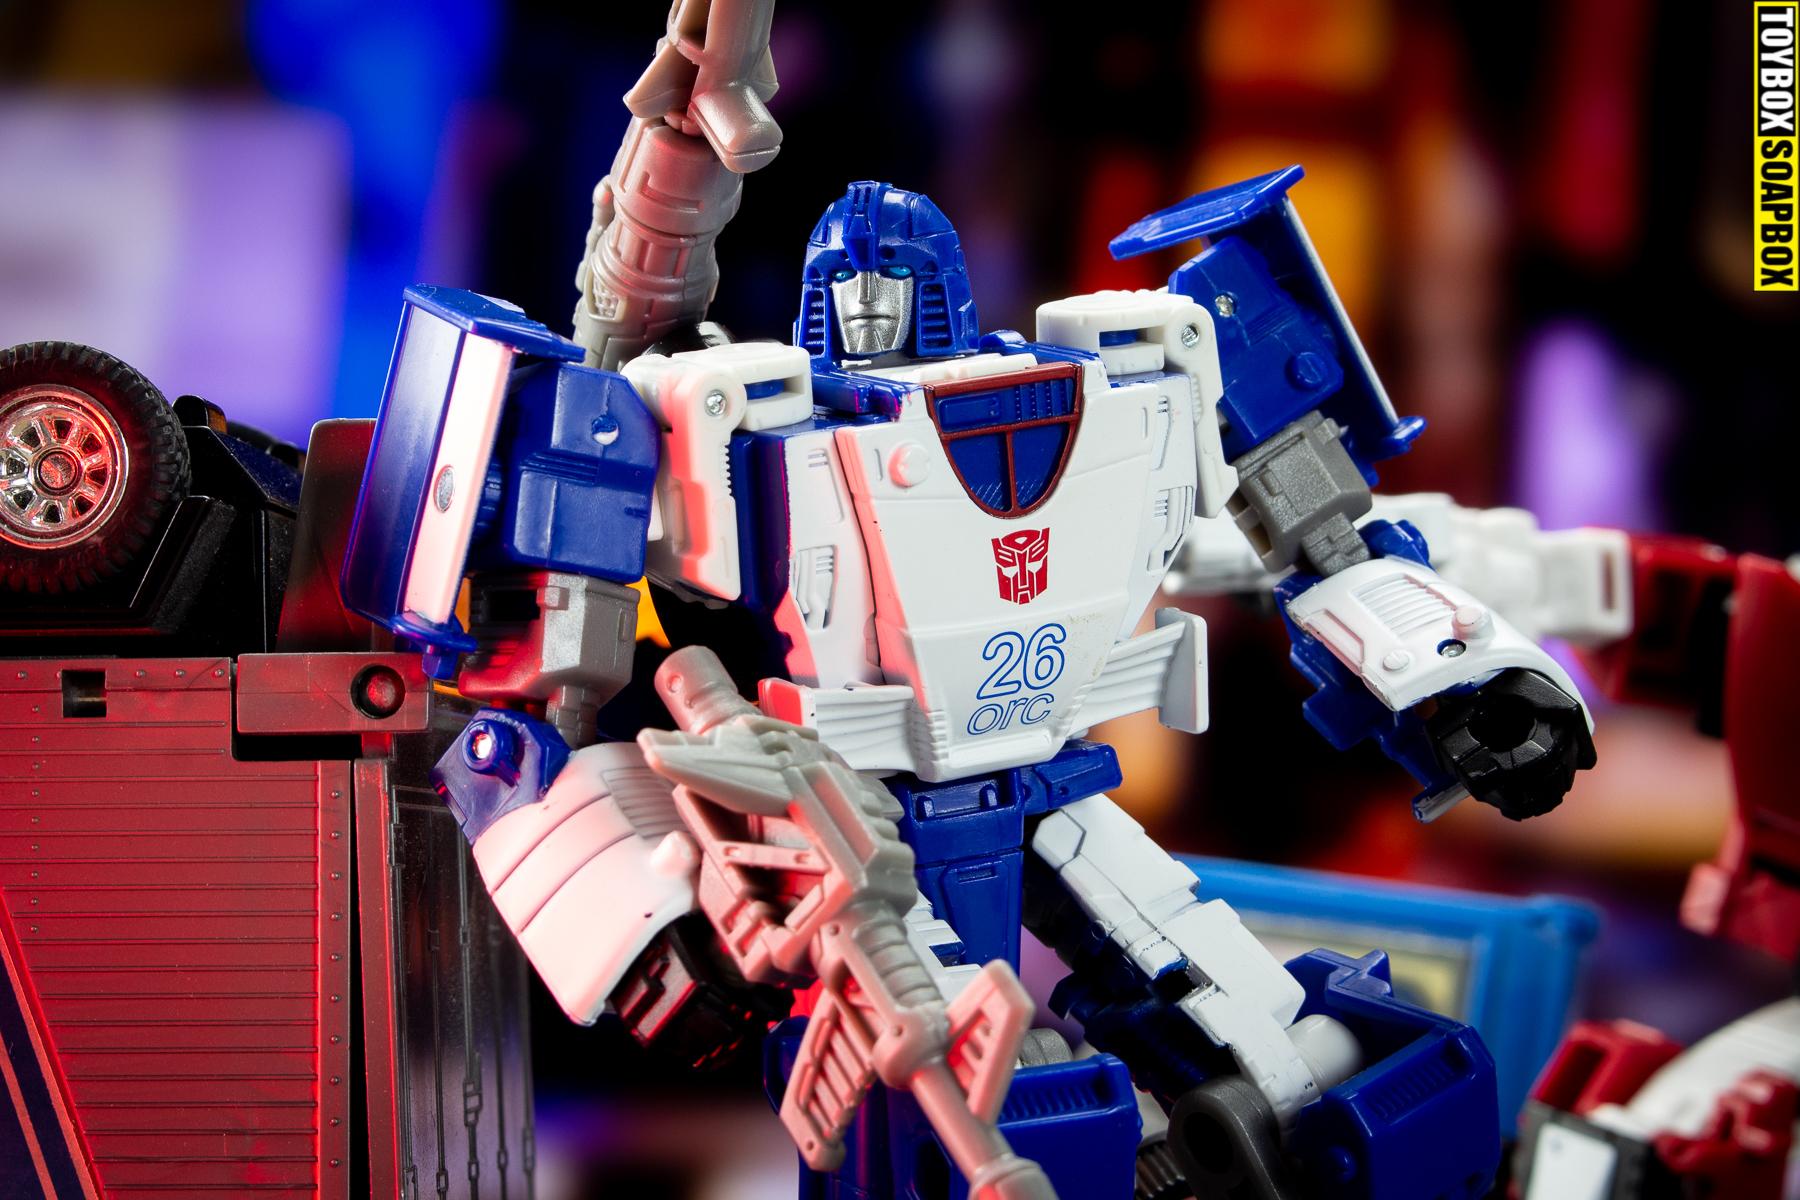 G1-transformers-generations-mirage